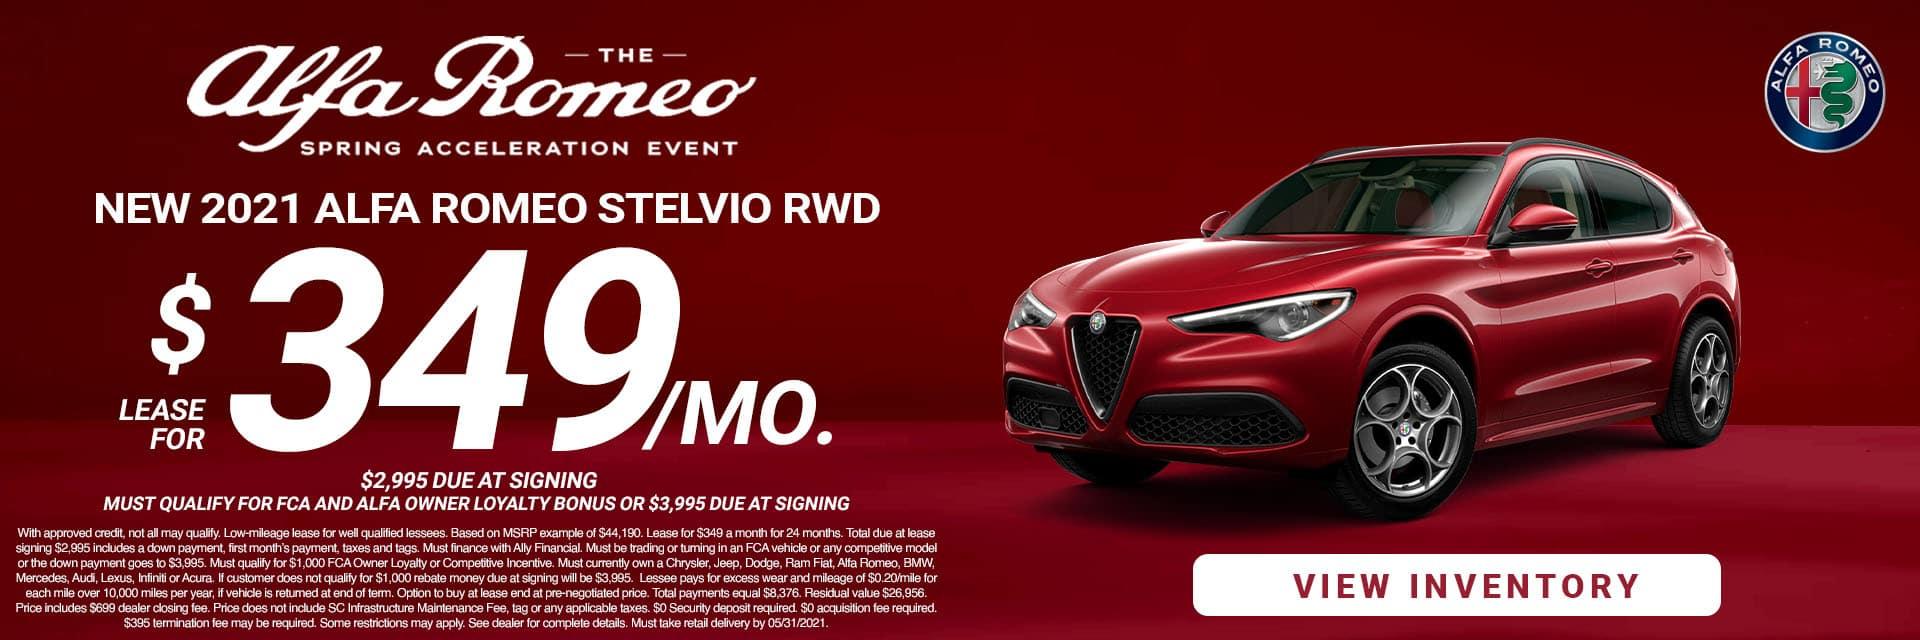 SLAR-May 20212021 Alfa Romeo Stelvio